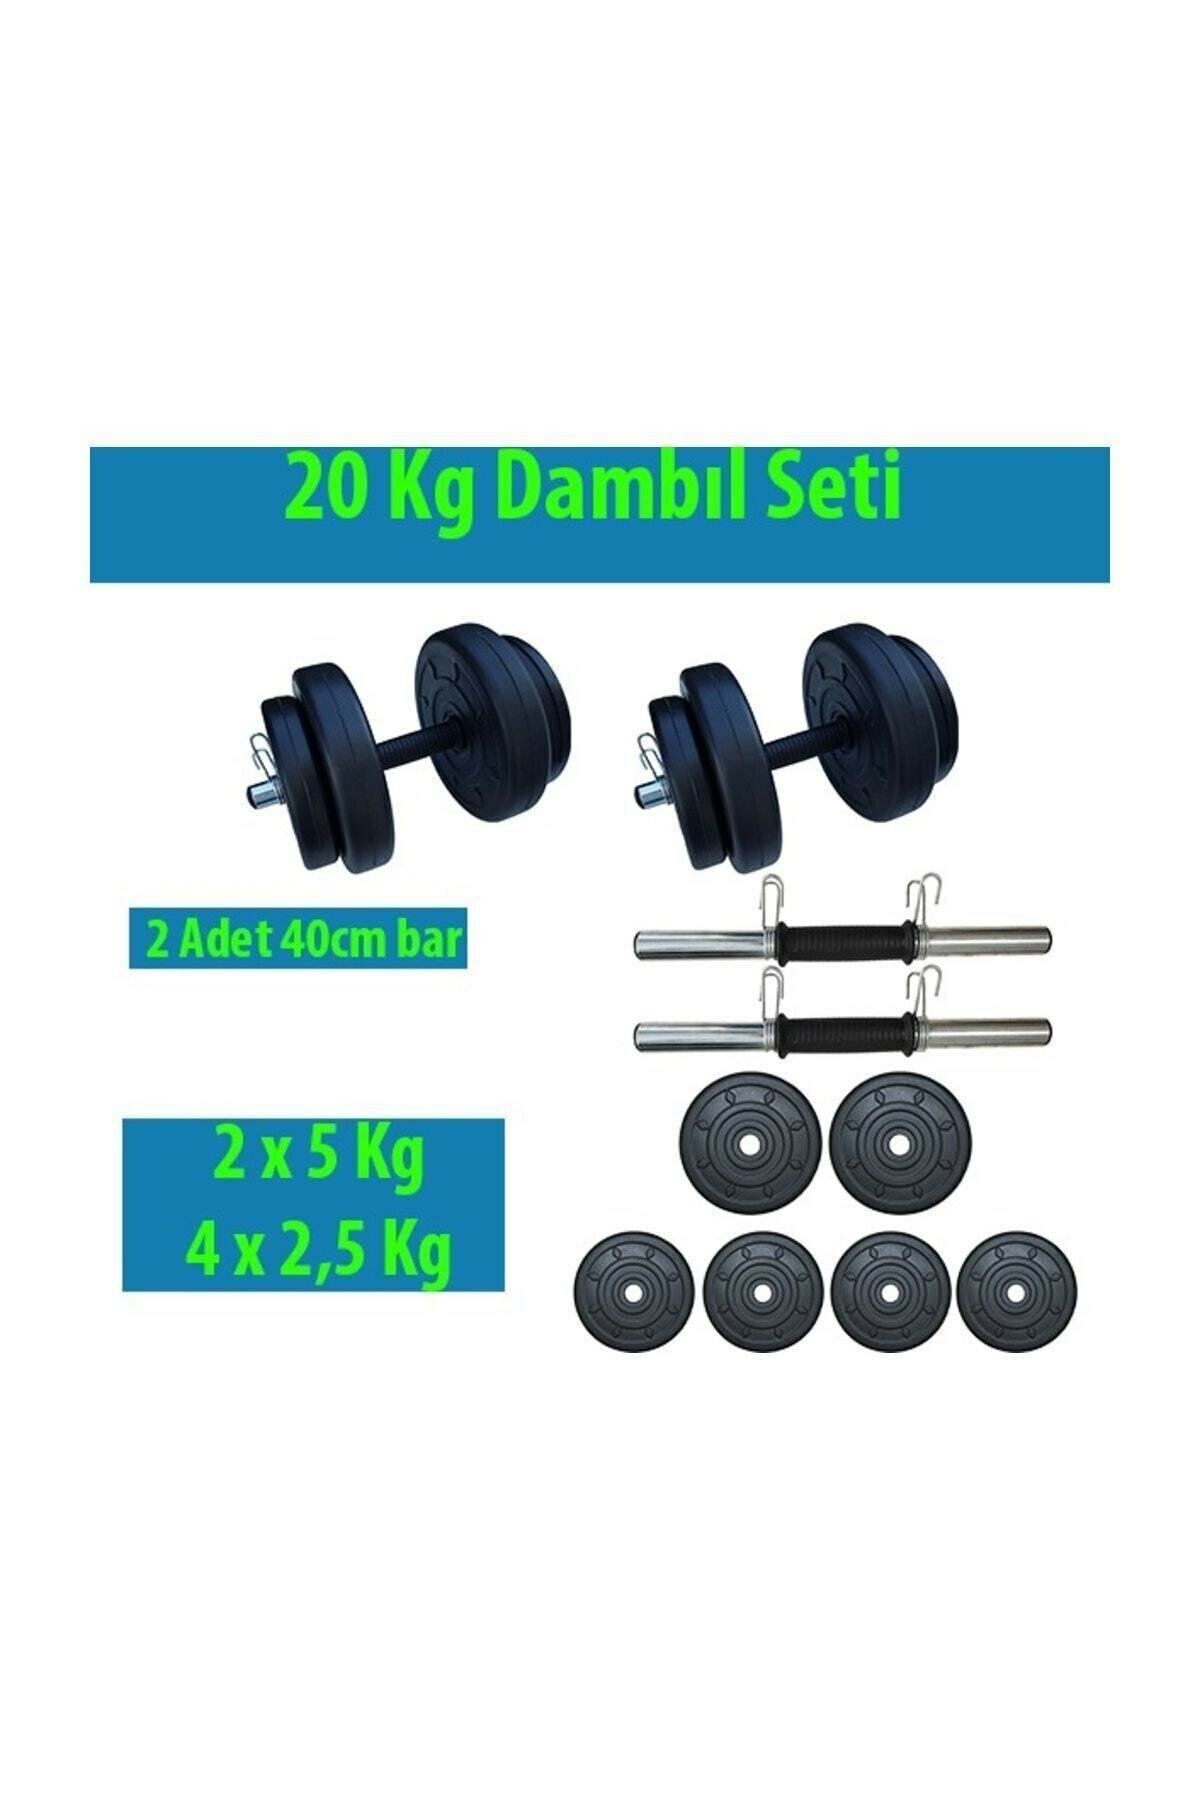 Dumbbell 65 KG Barbell Set Dumbbell Set Weight and Body Building Tool 65 KG Gym Dumbell Set